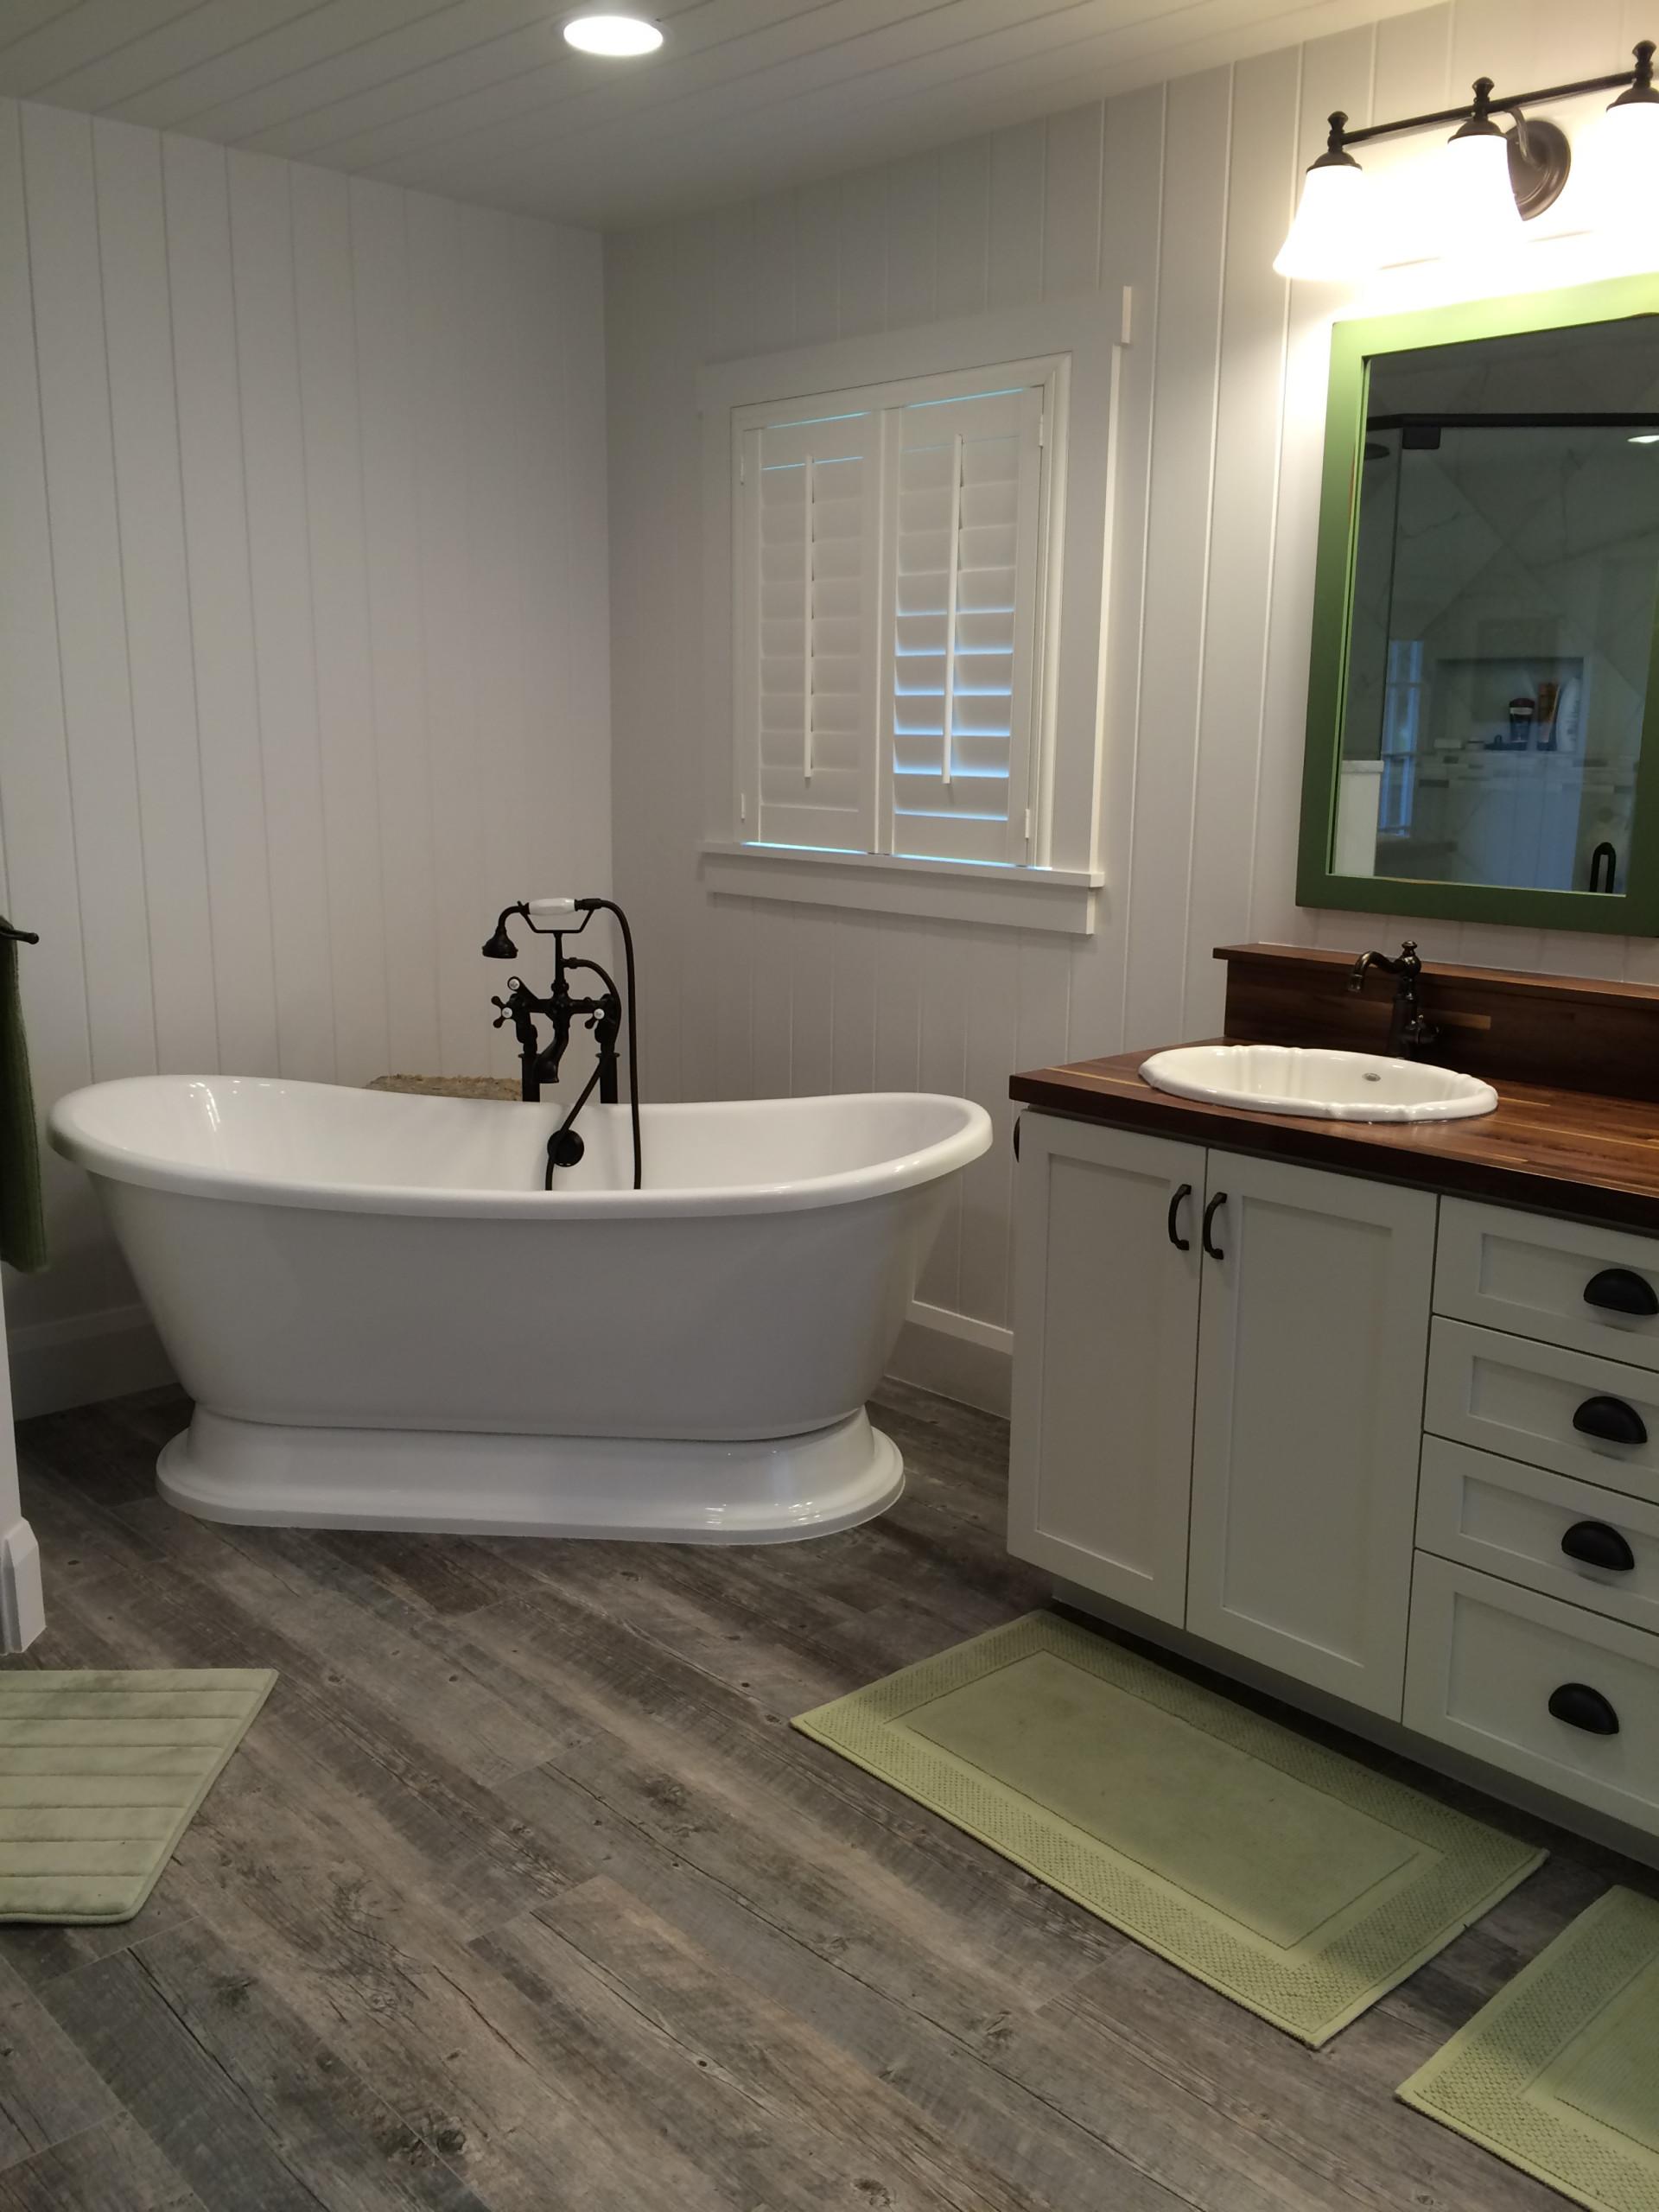 Master Bath Renovation - Country Flair